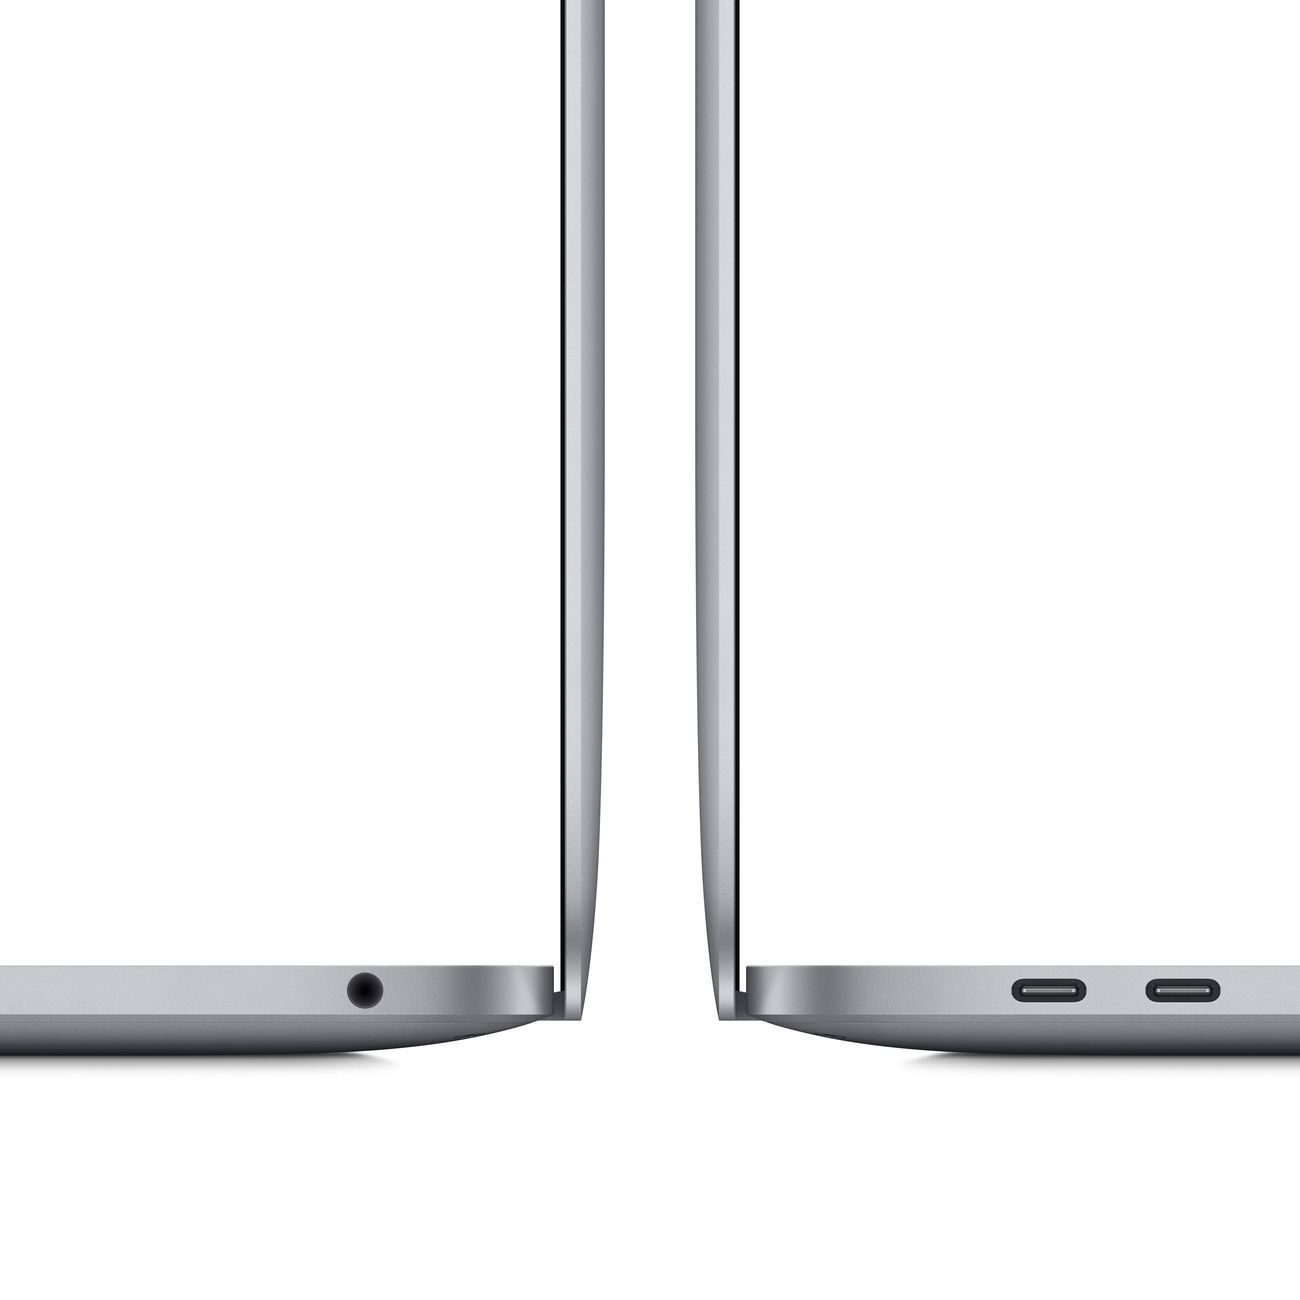 Ноутбук Apple MacBook Pro 13 M1/8/256 Space Gray (MYD82RU/A)